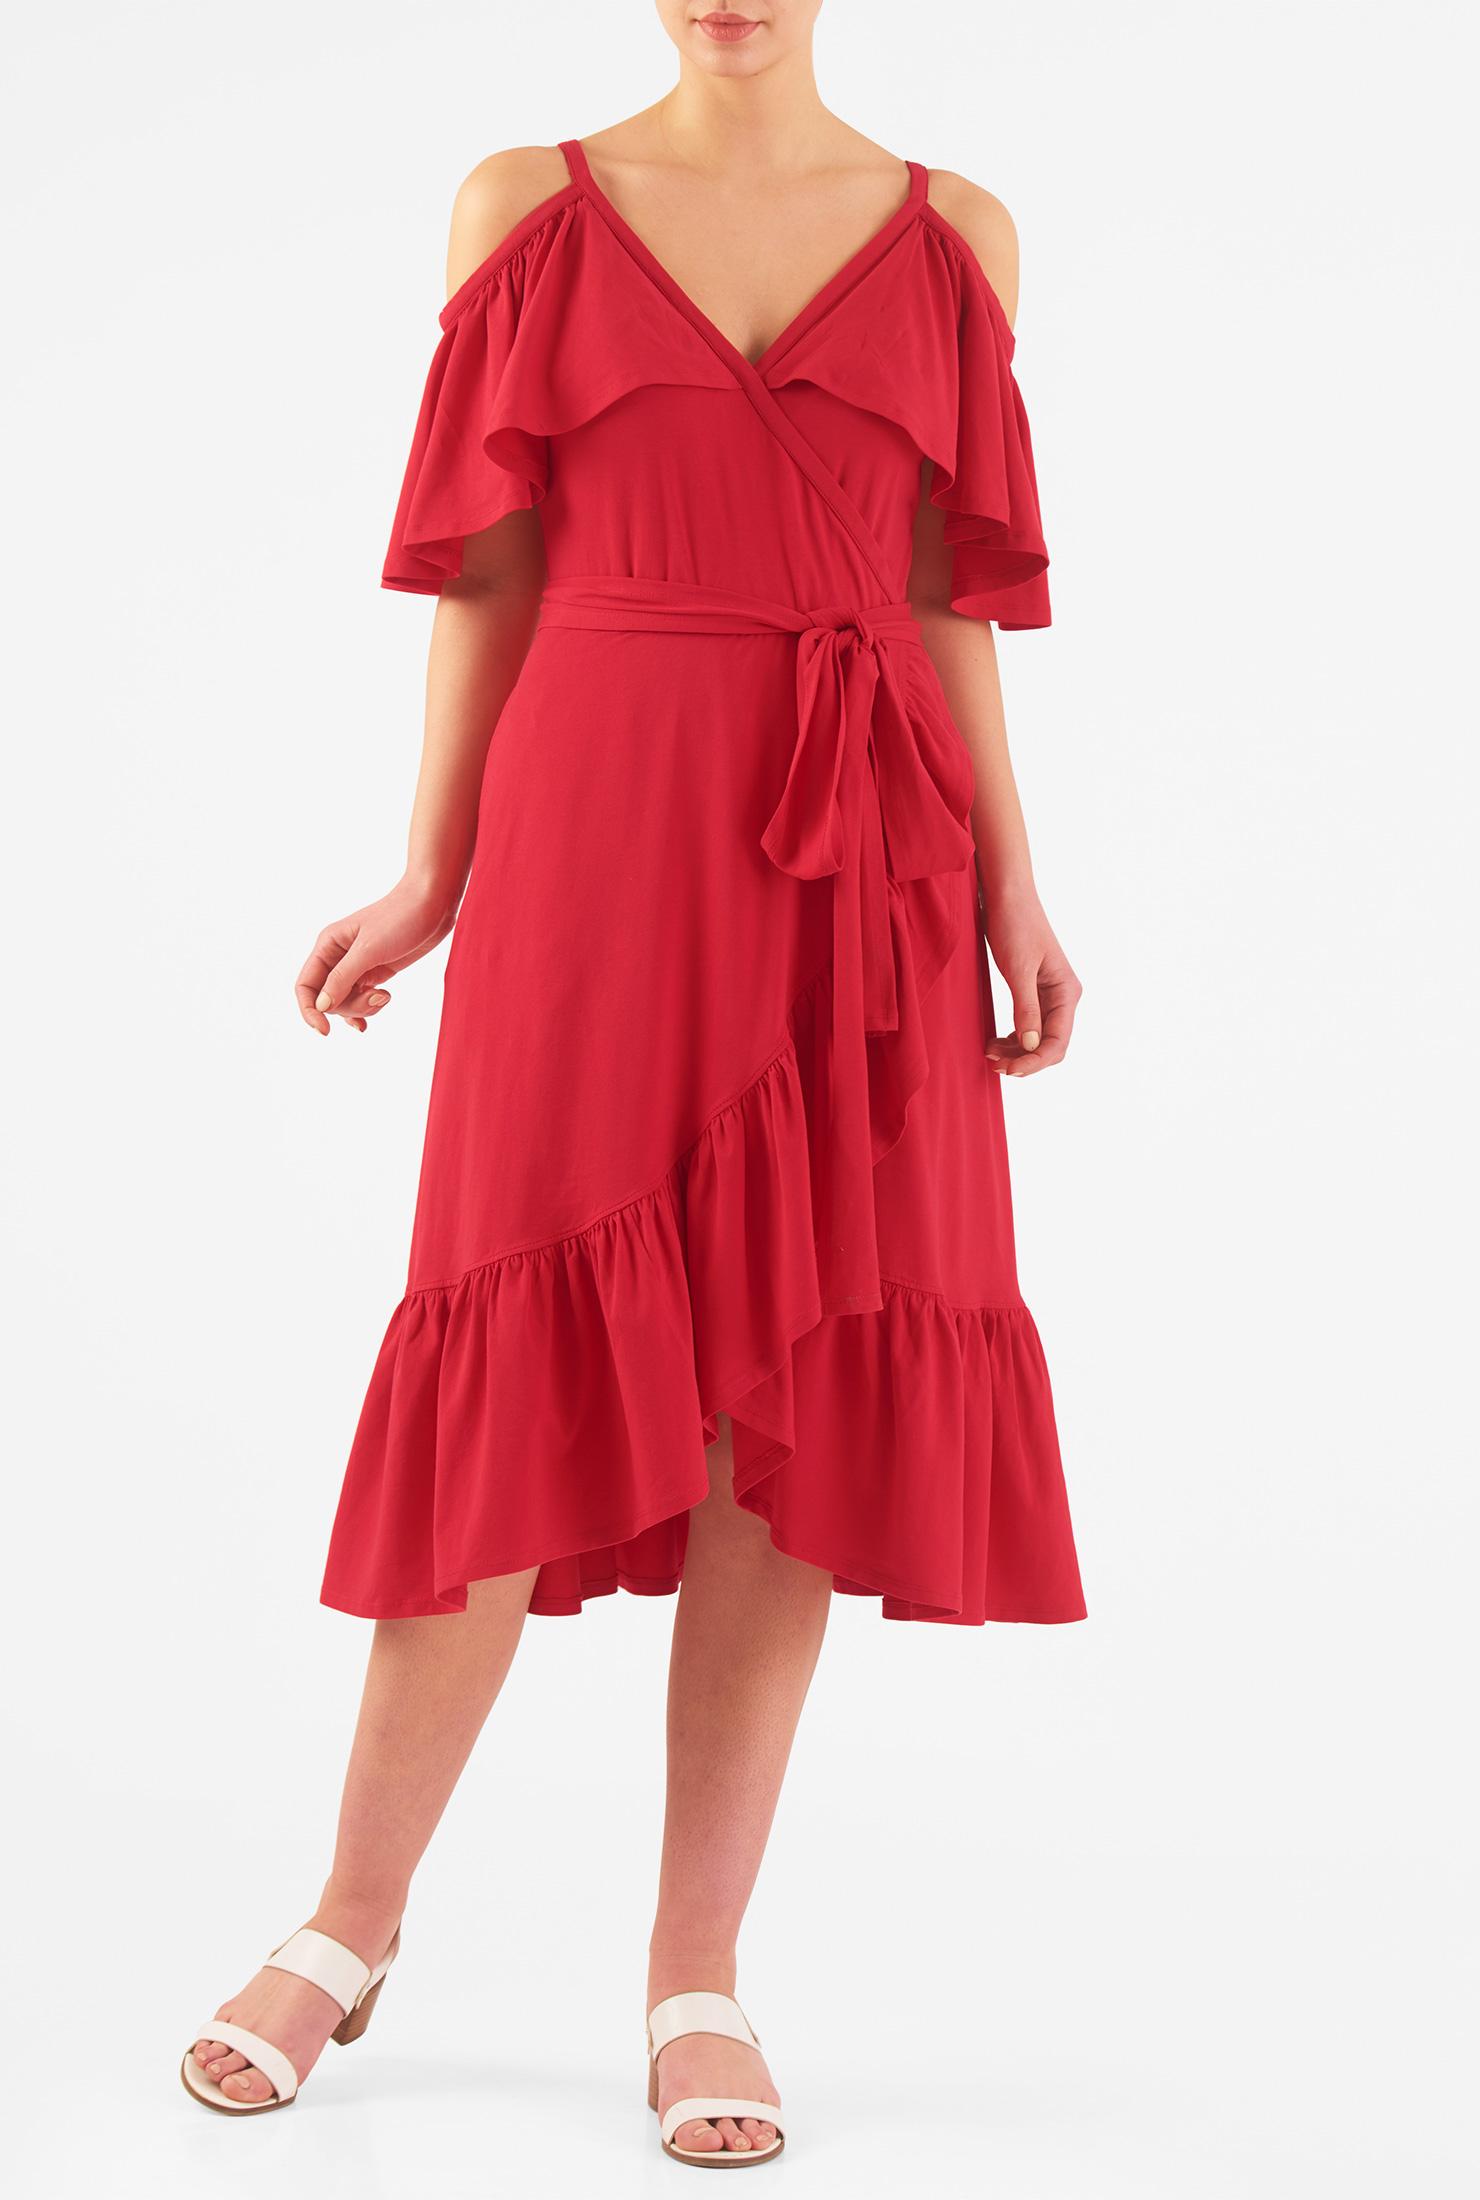 eShakti Women's Cold shoulder ruffle cotton knit faux-wrap dress CL0045933